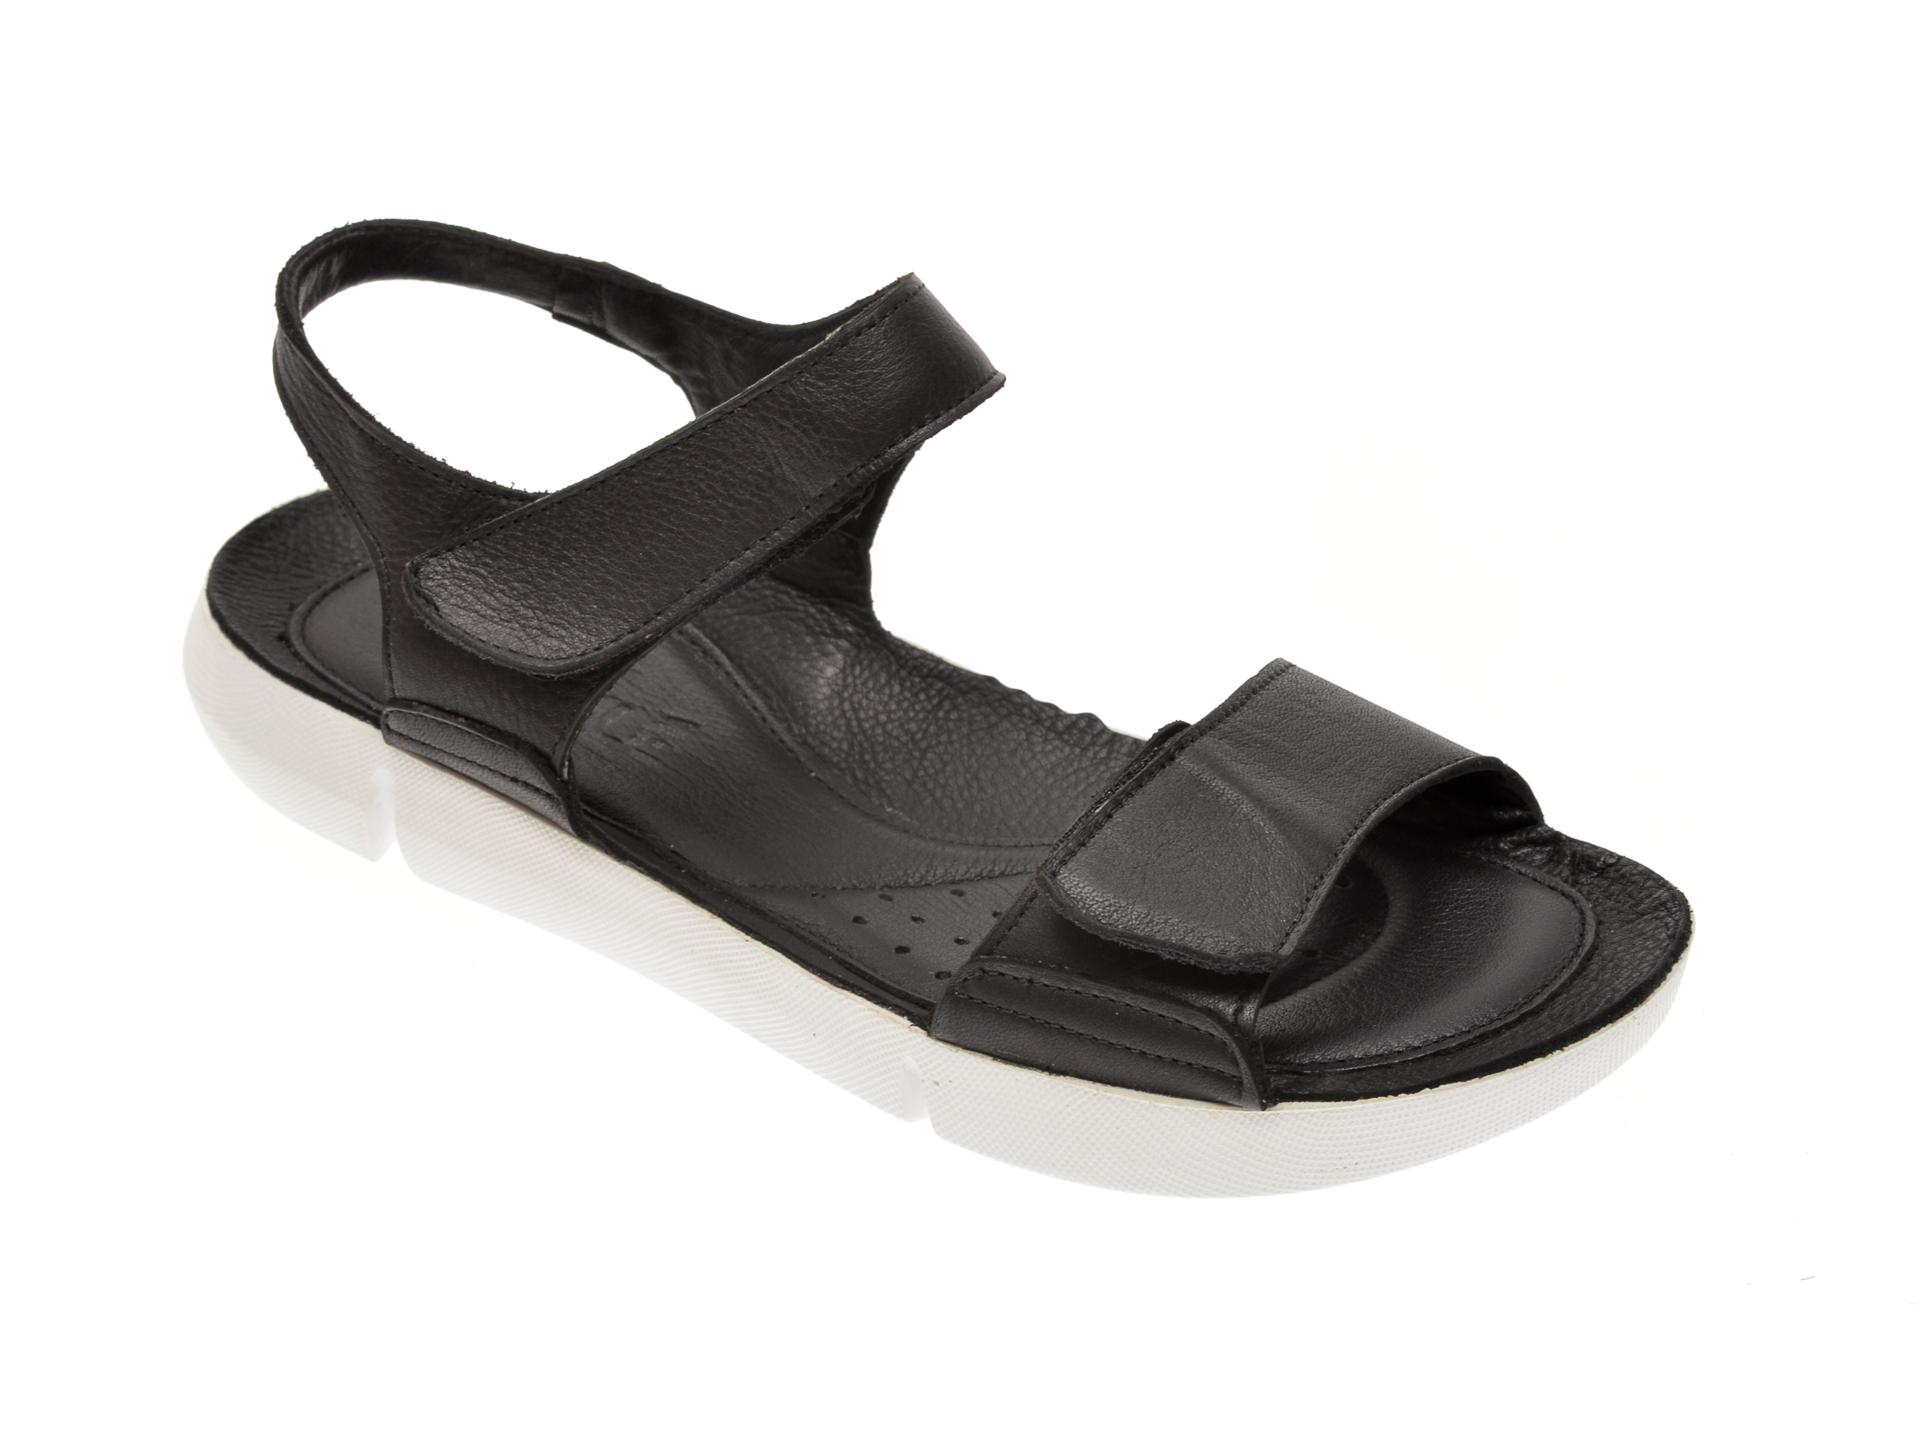 Sandale NICOLE negre, 6004, din piele naturala New